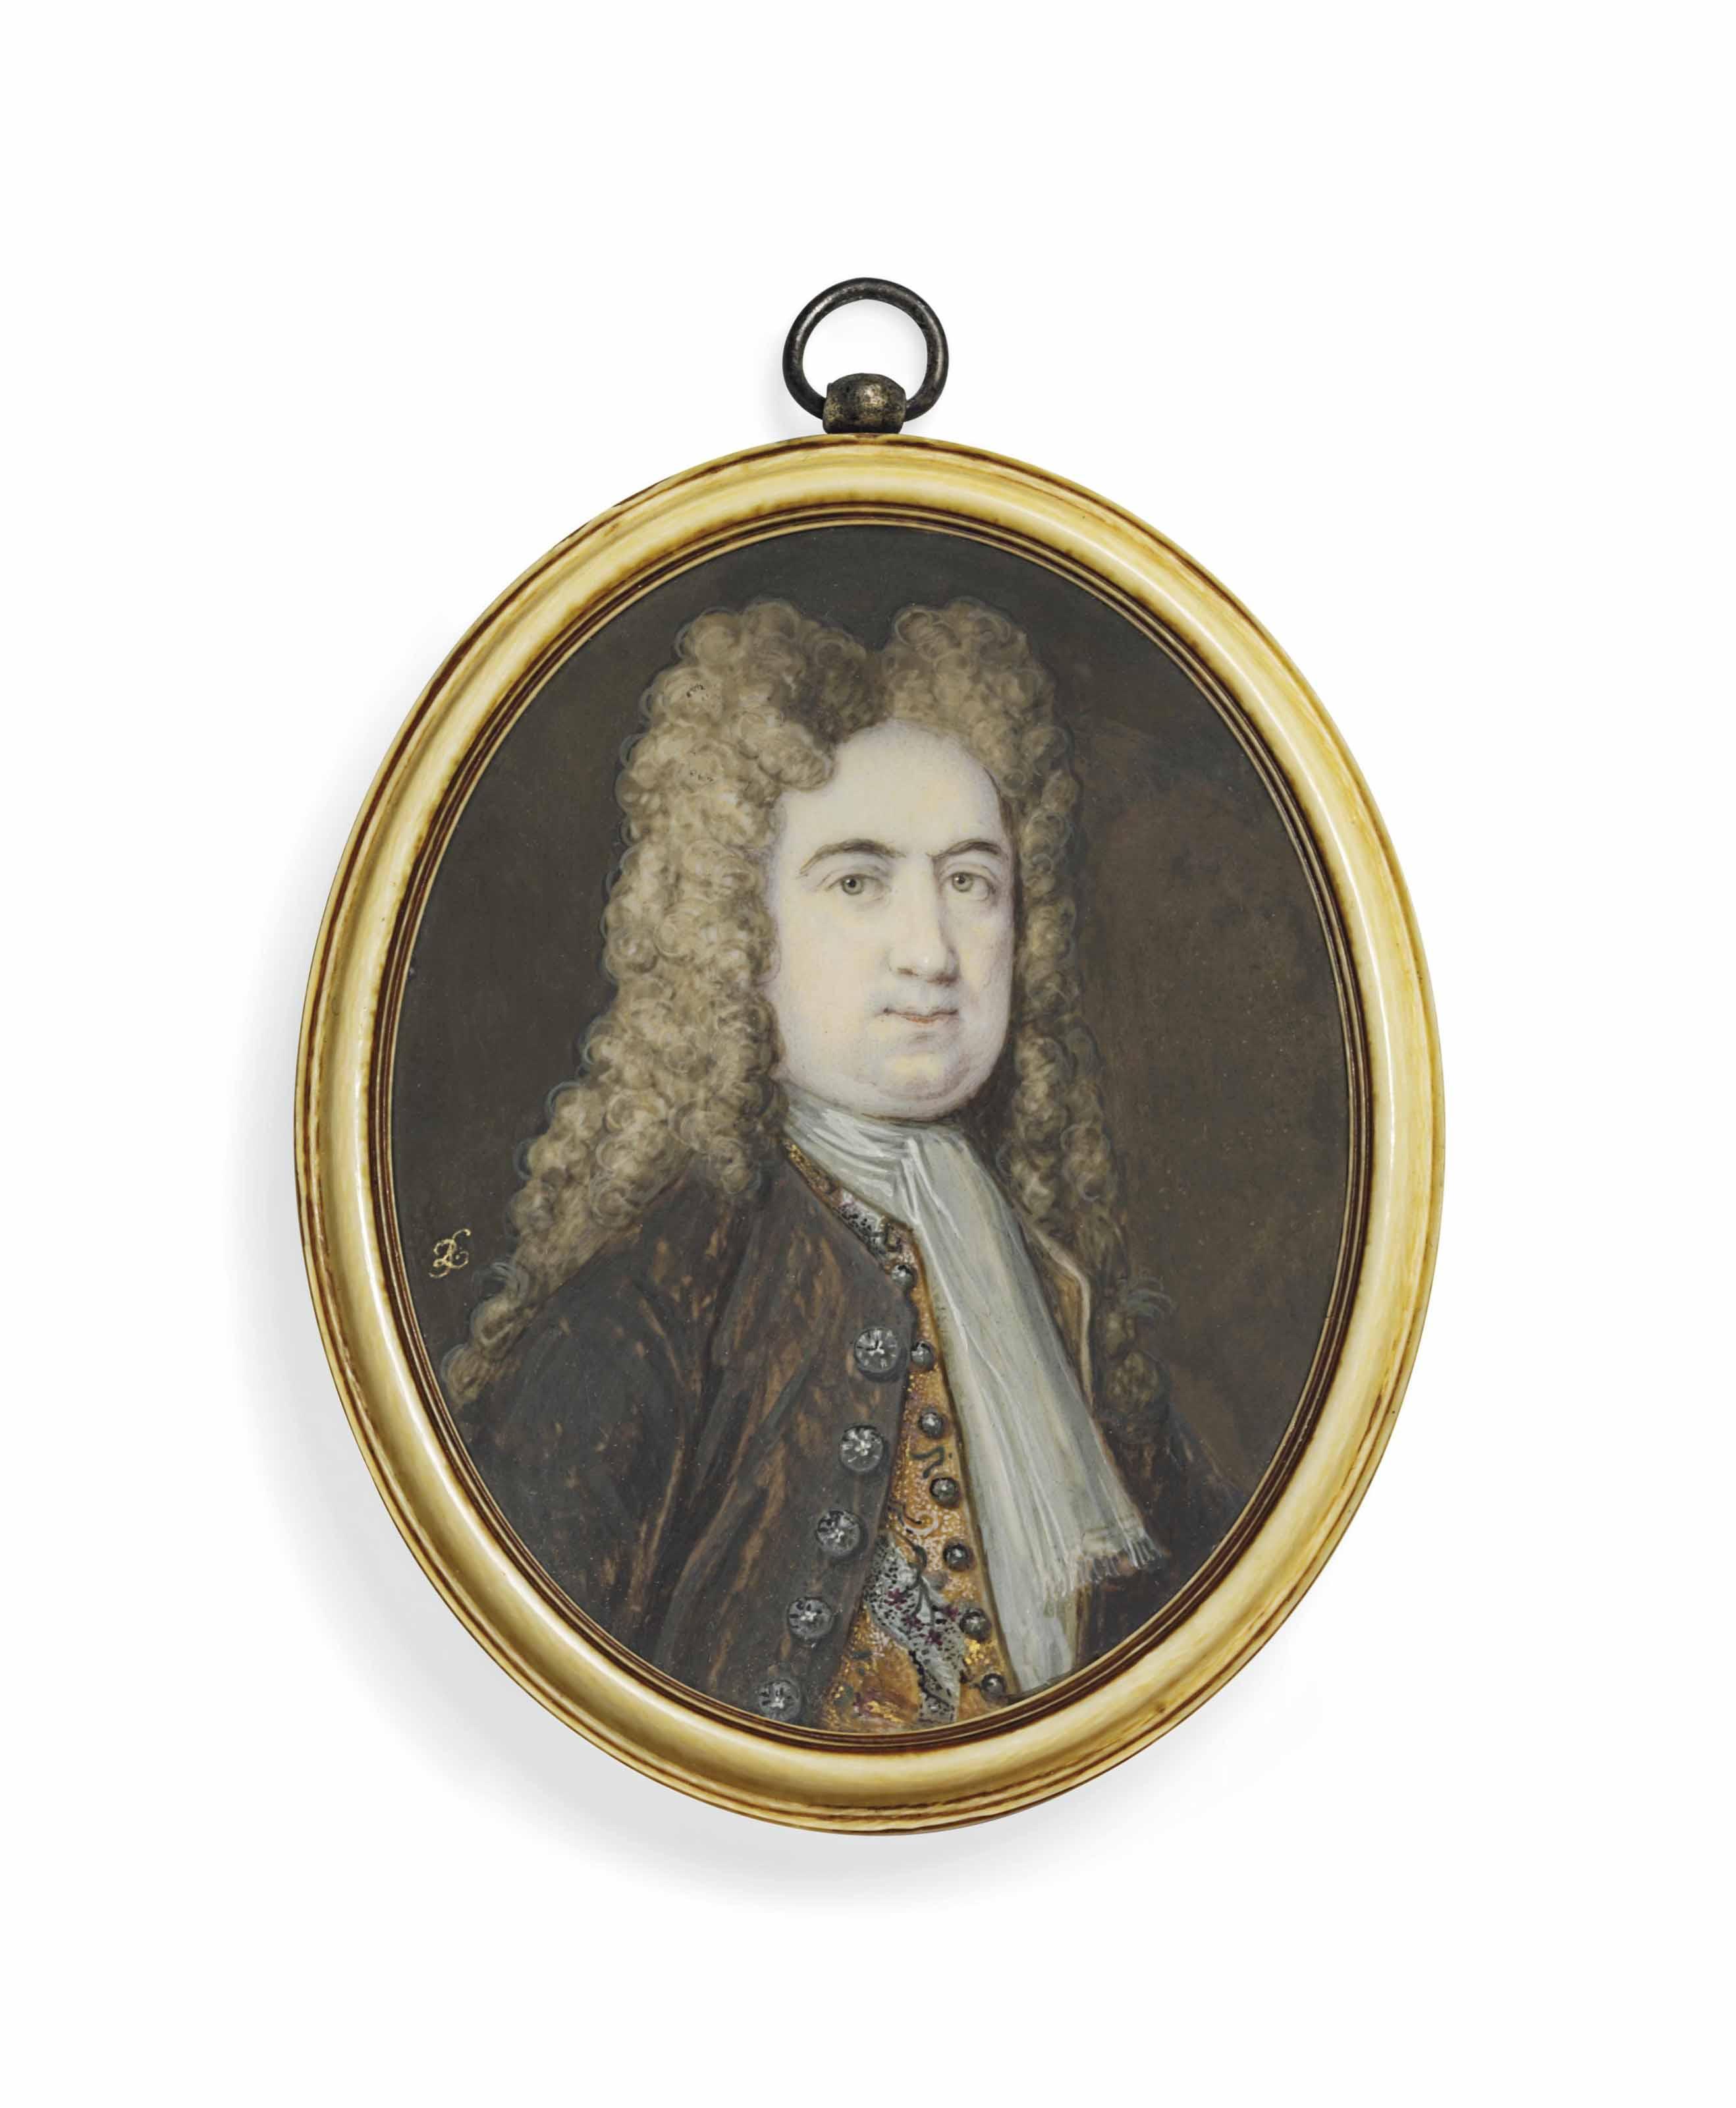 BERNARD LENS (BRITISH, 1682-1740)